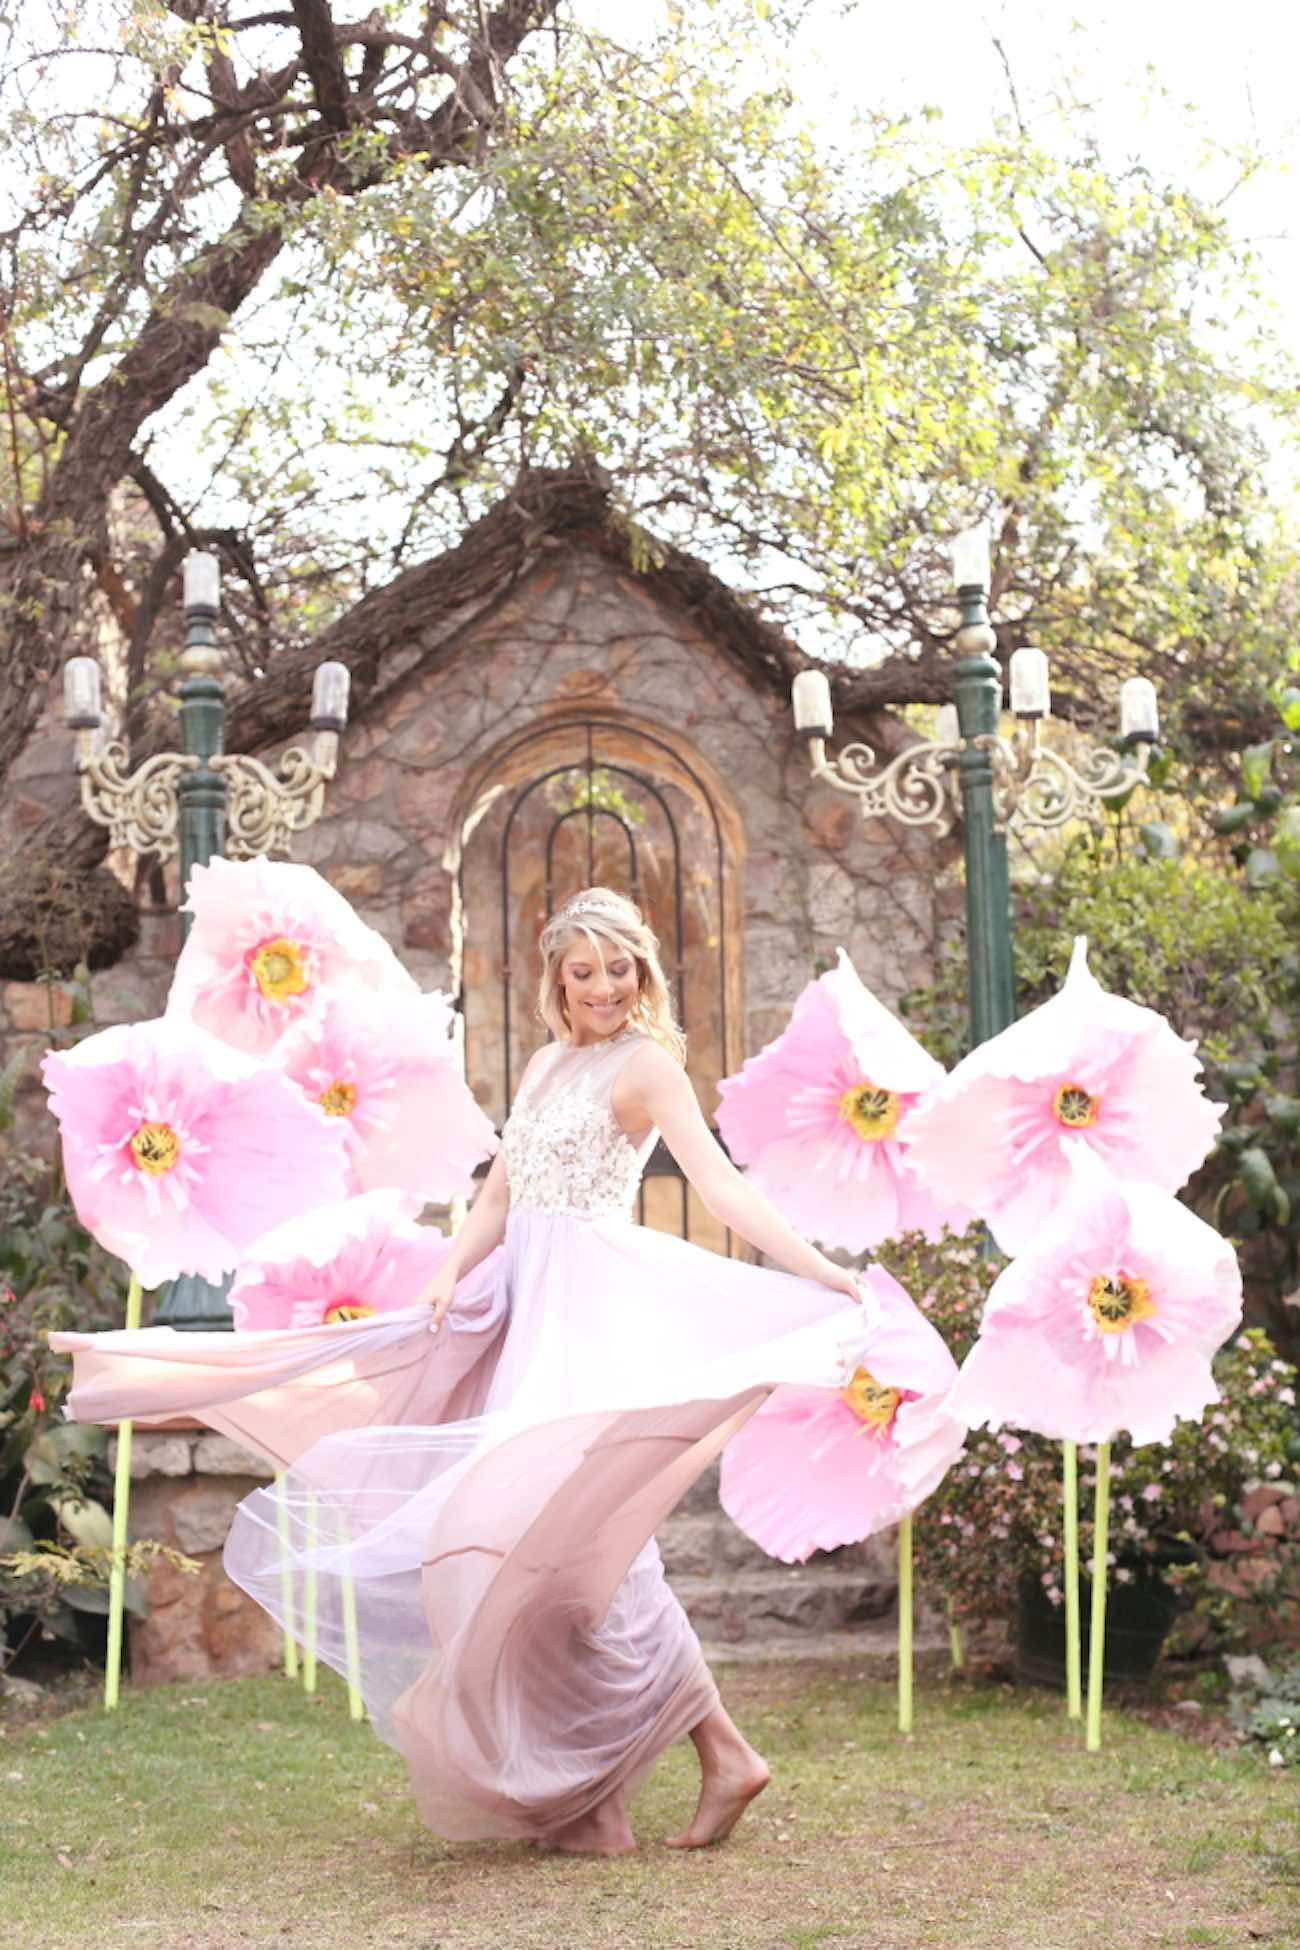 Alice in Wonderland Wedding Giant Paper Flowers Whimsy